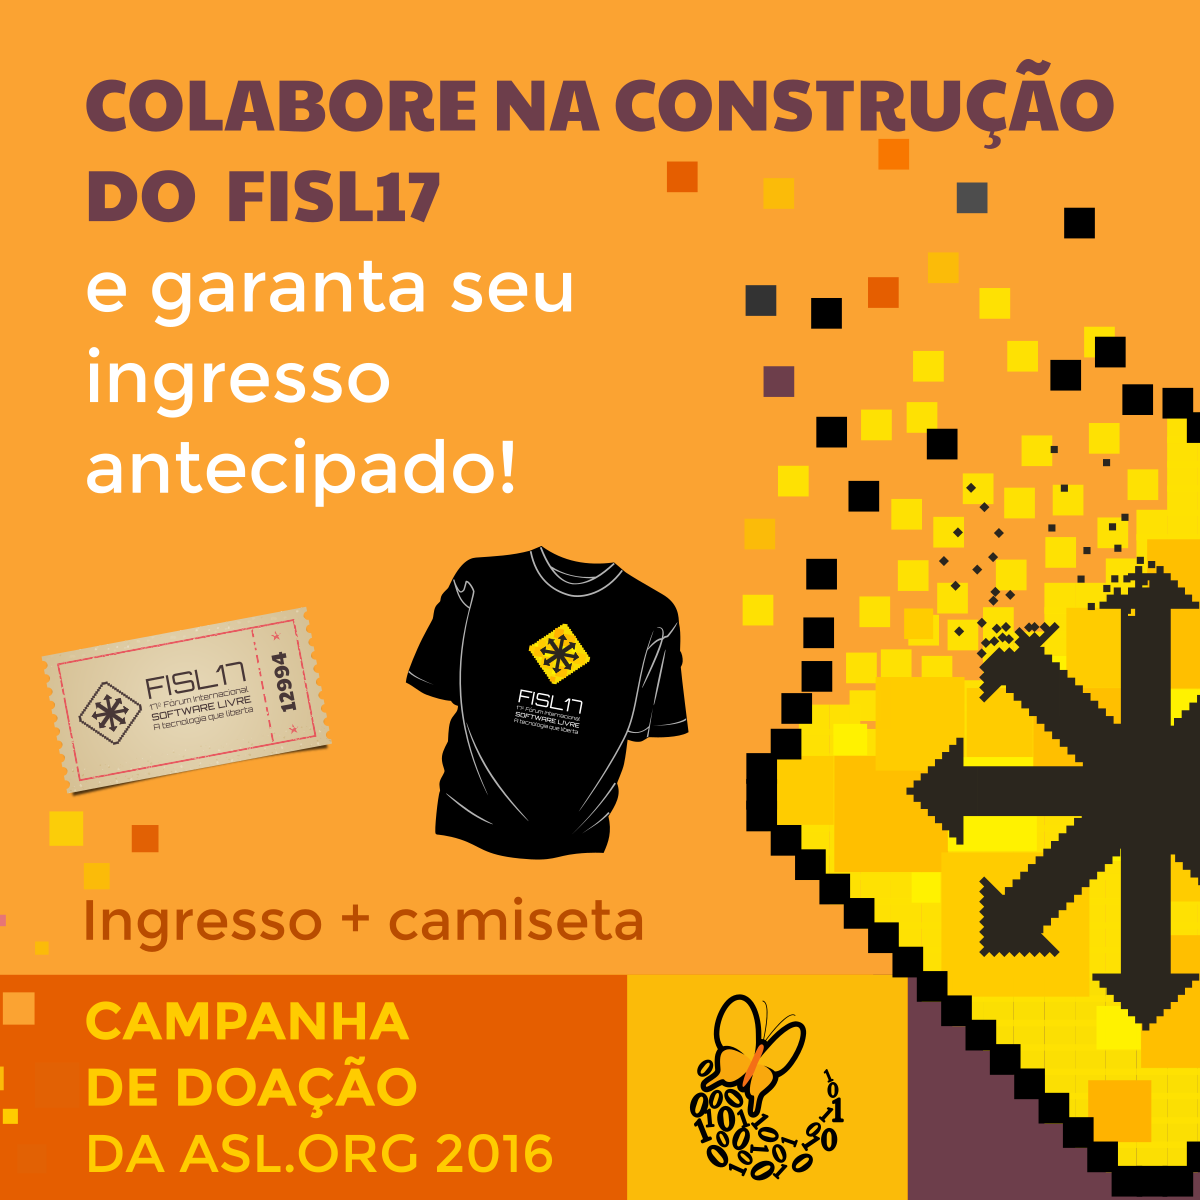 Ingresso Antecipado + Camiseta Oficial do #FISL17! Saiba como:  https://t.co/cVFic55lHf https://t.co/TUc6E6vF2t